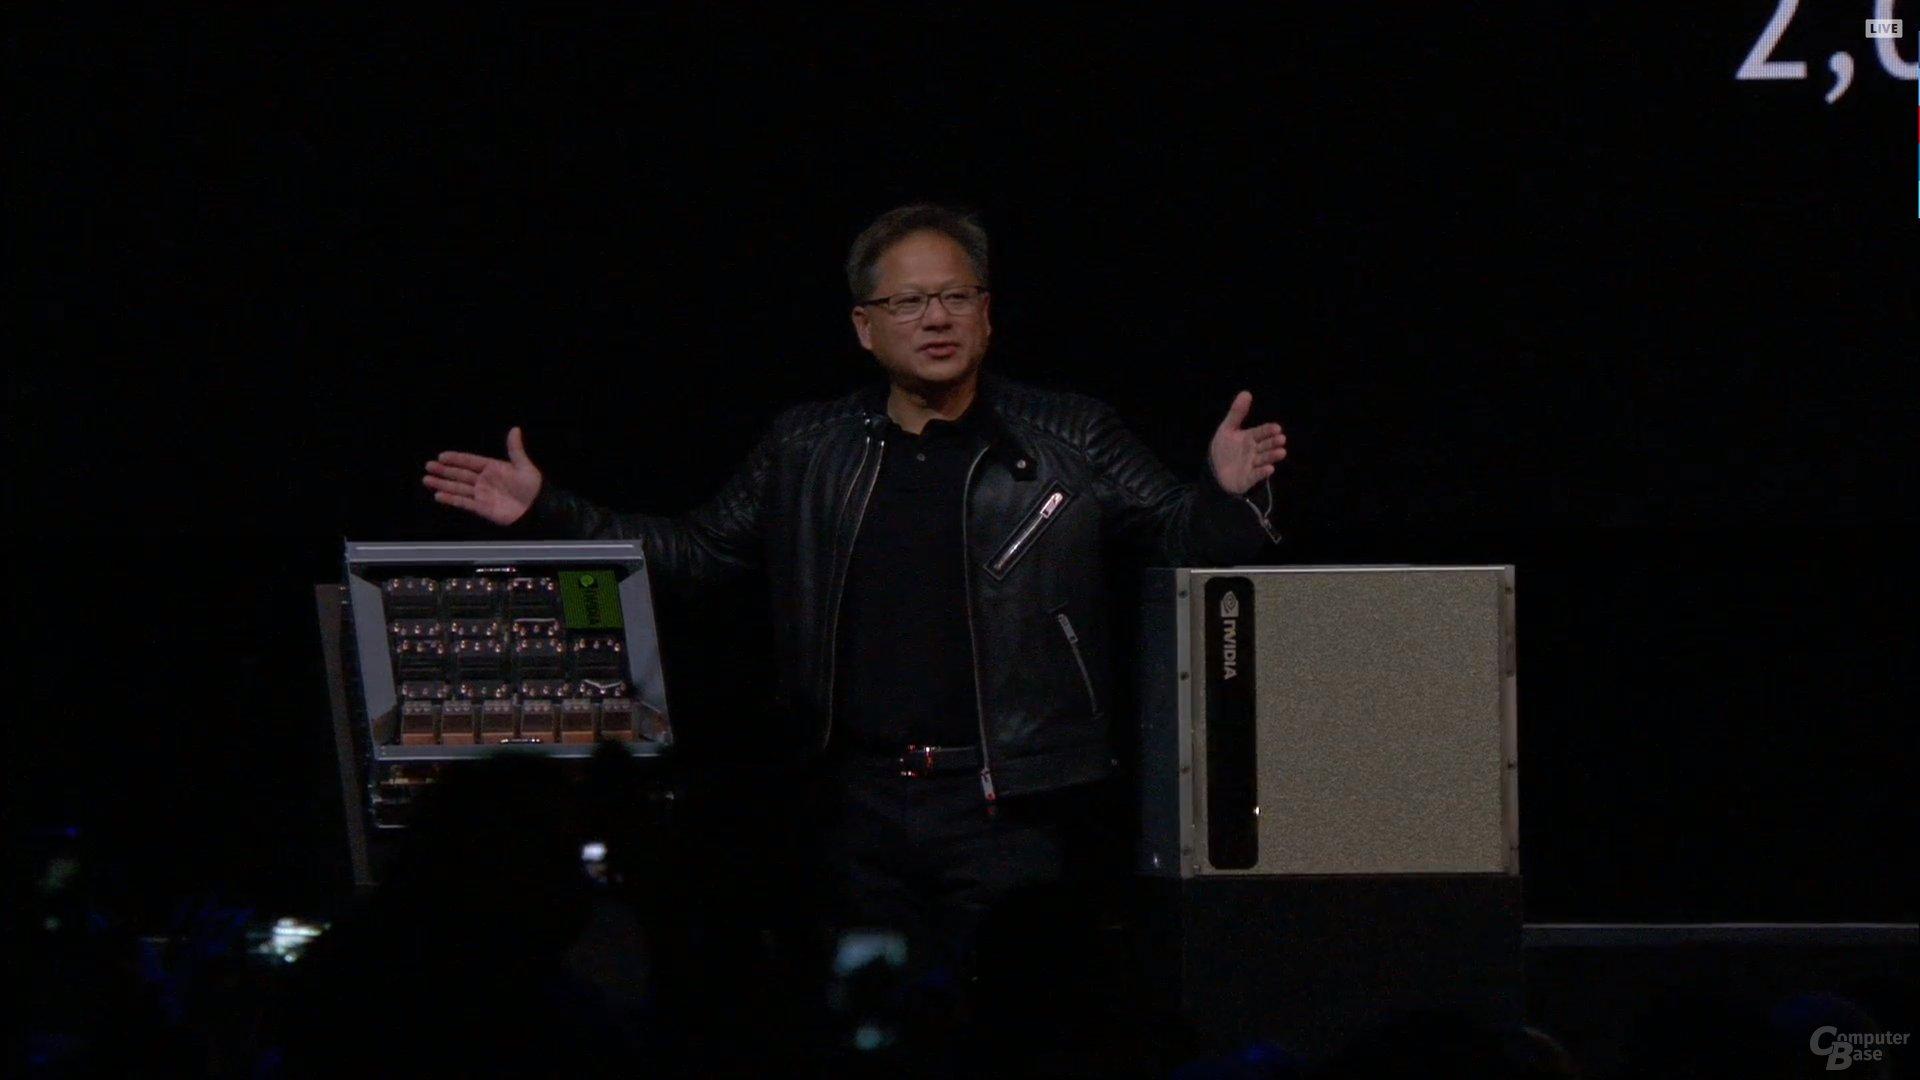 Nvidia GDX2 mit NVSwitch und 16 GV100-GPUs